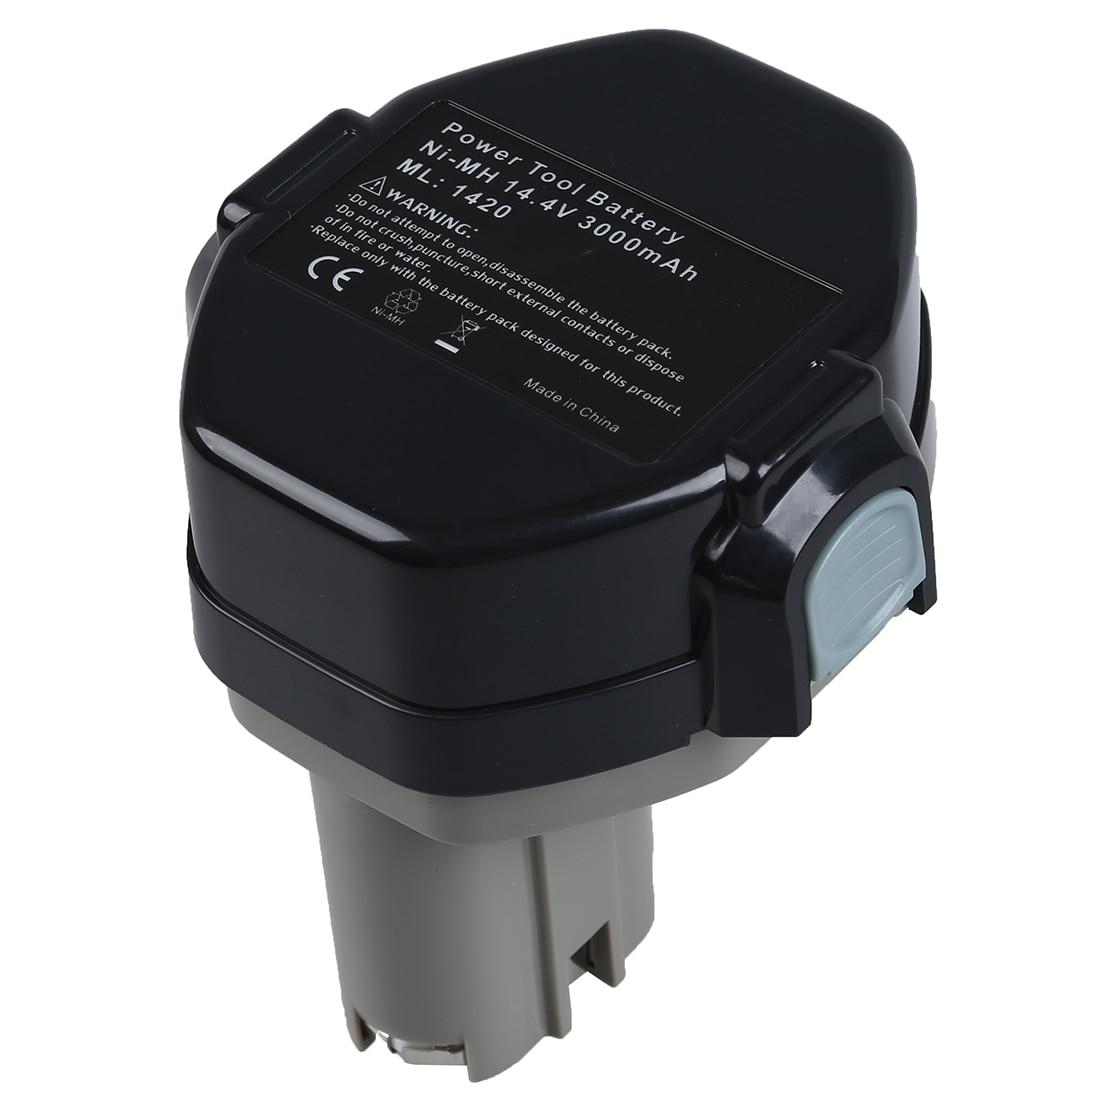 14.4 V Battery For MAKITA 1433 1434 Makita 6233D 4033D 6333D 6336D 6337D 8433D, black+gray